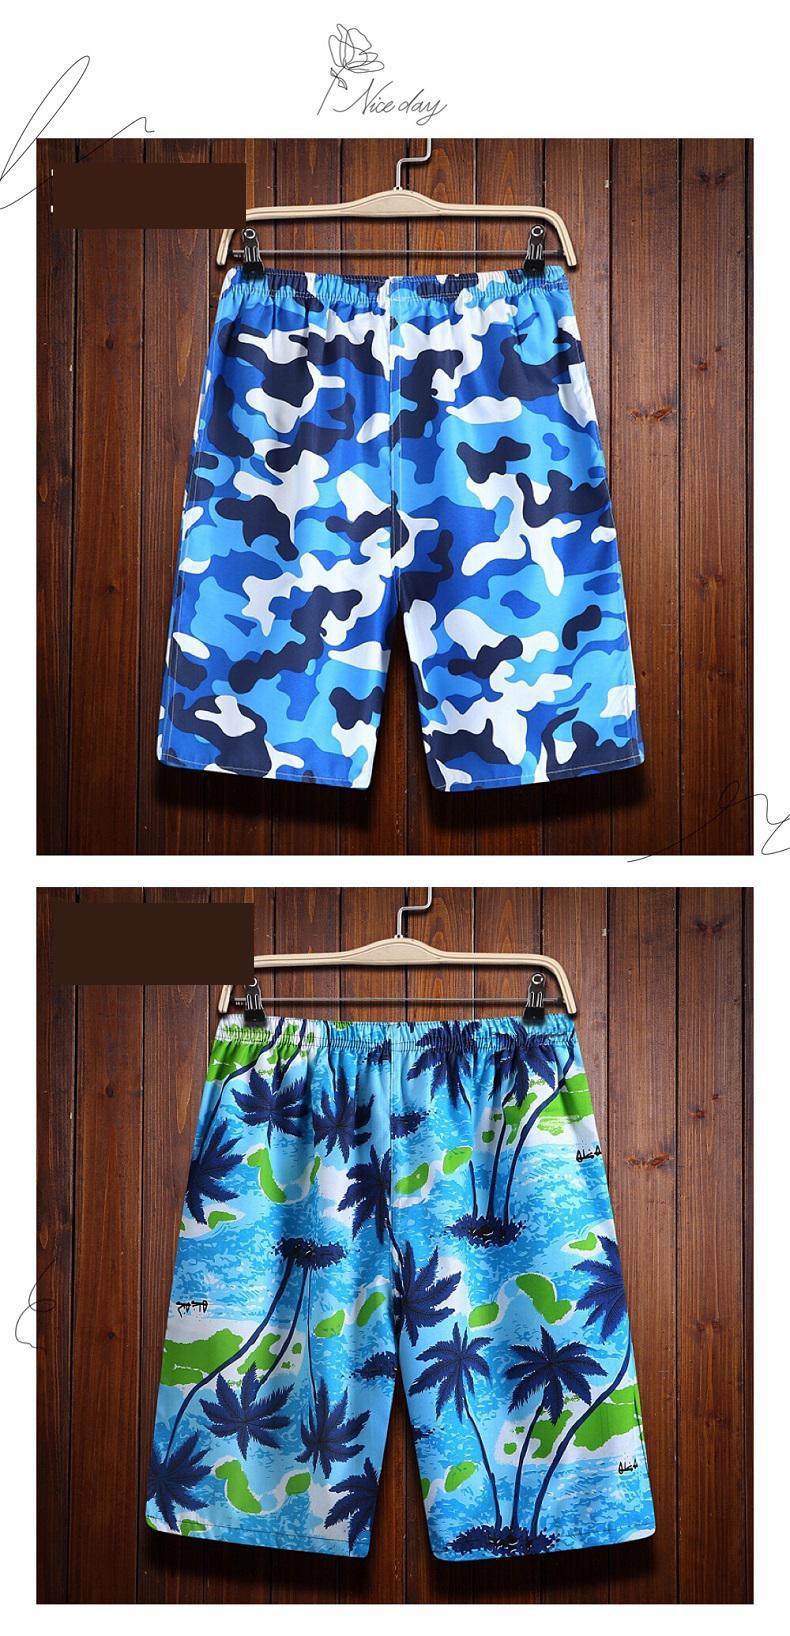 10 Patterns Camouflage Compression Shorts Men Summer Clothing Board Shorts Nylon Bottom Men Side Pockets Men's Swimwear 5